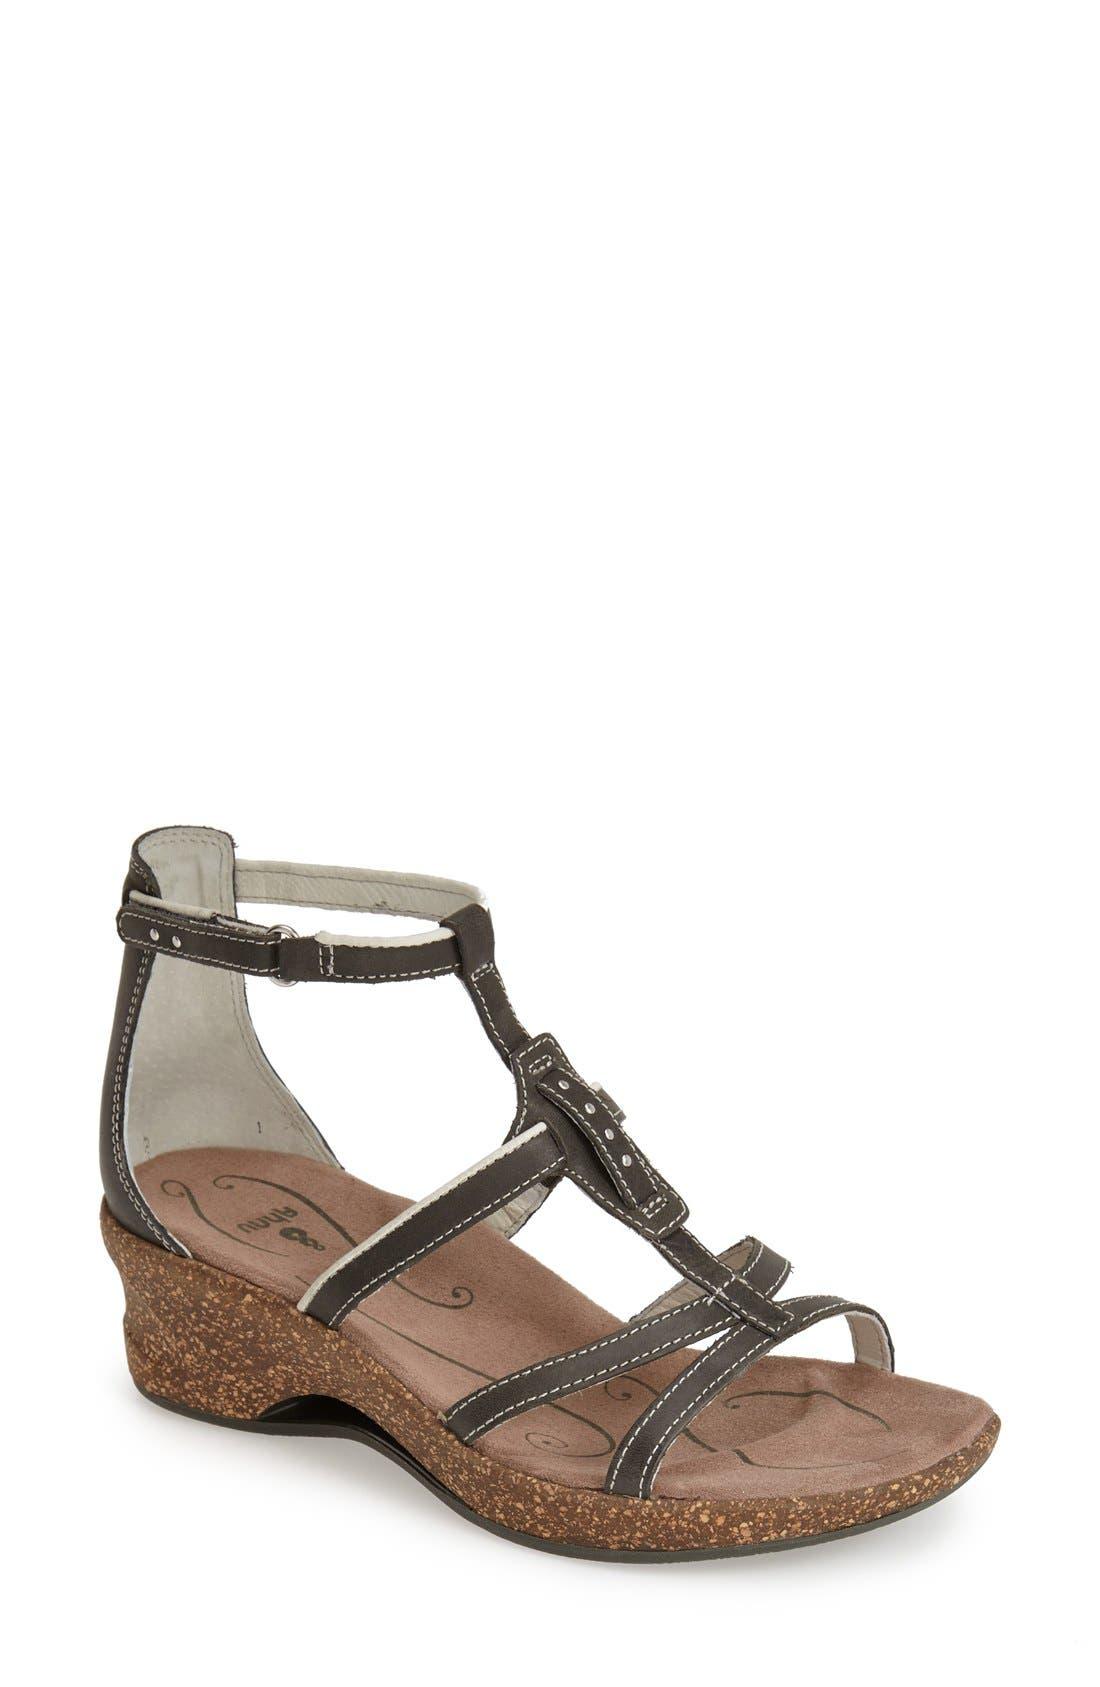 Main Image - Ahnu 'Alta' Sandal